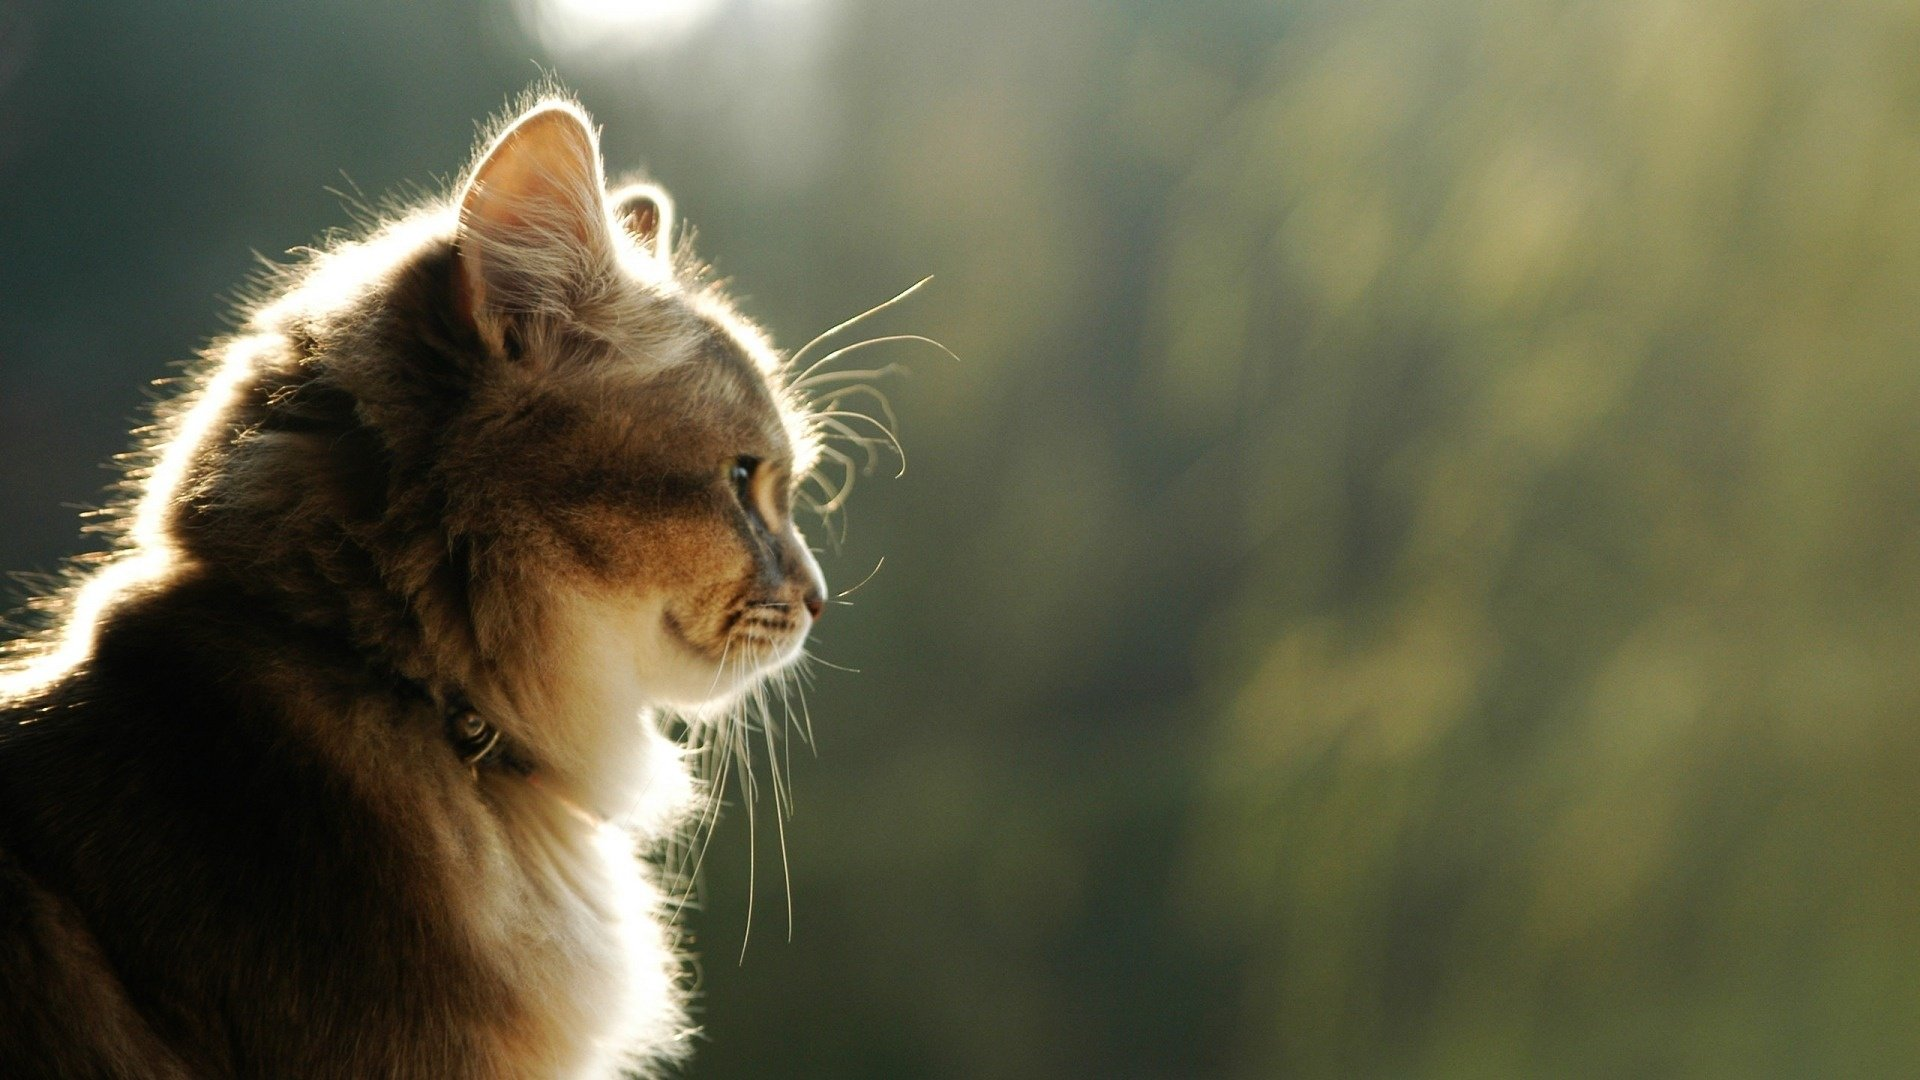 Cat Background Observing Beautiful Animals Desktop wallpapers HD 1920x1080